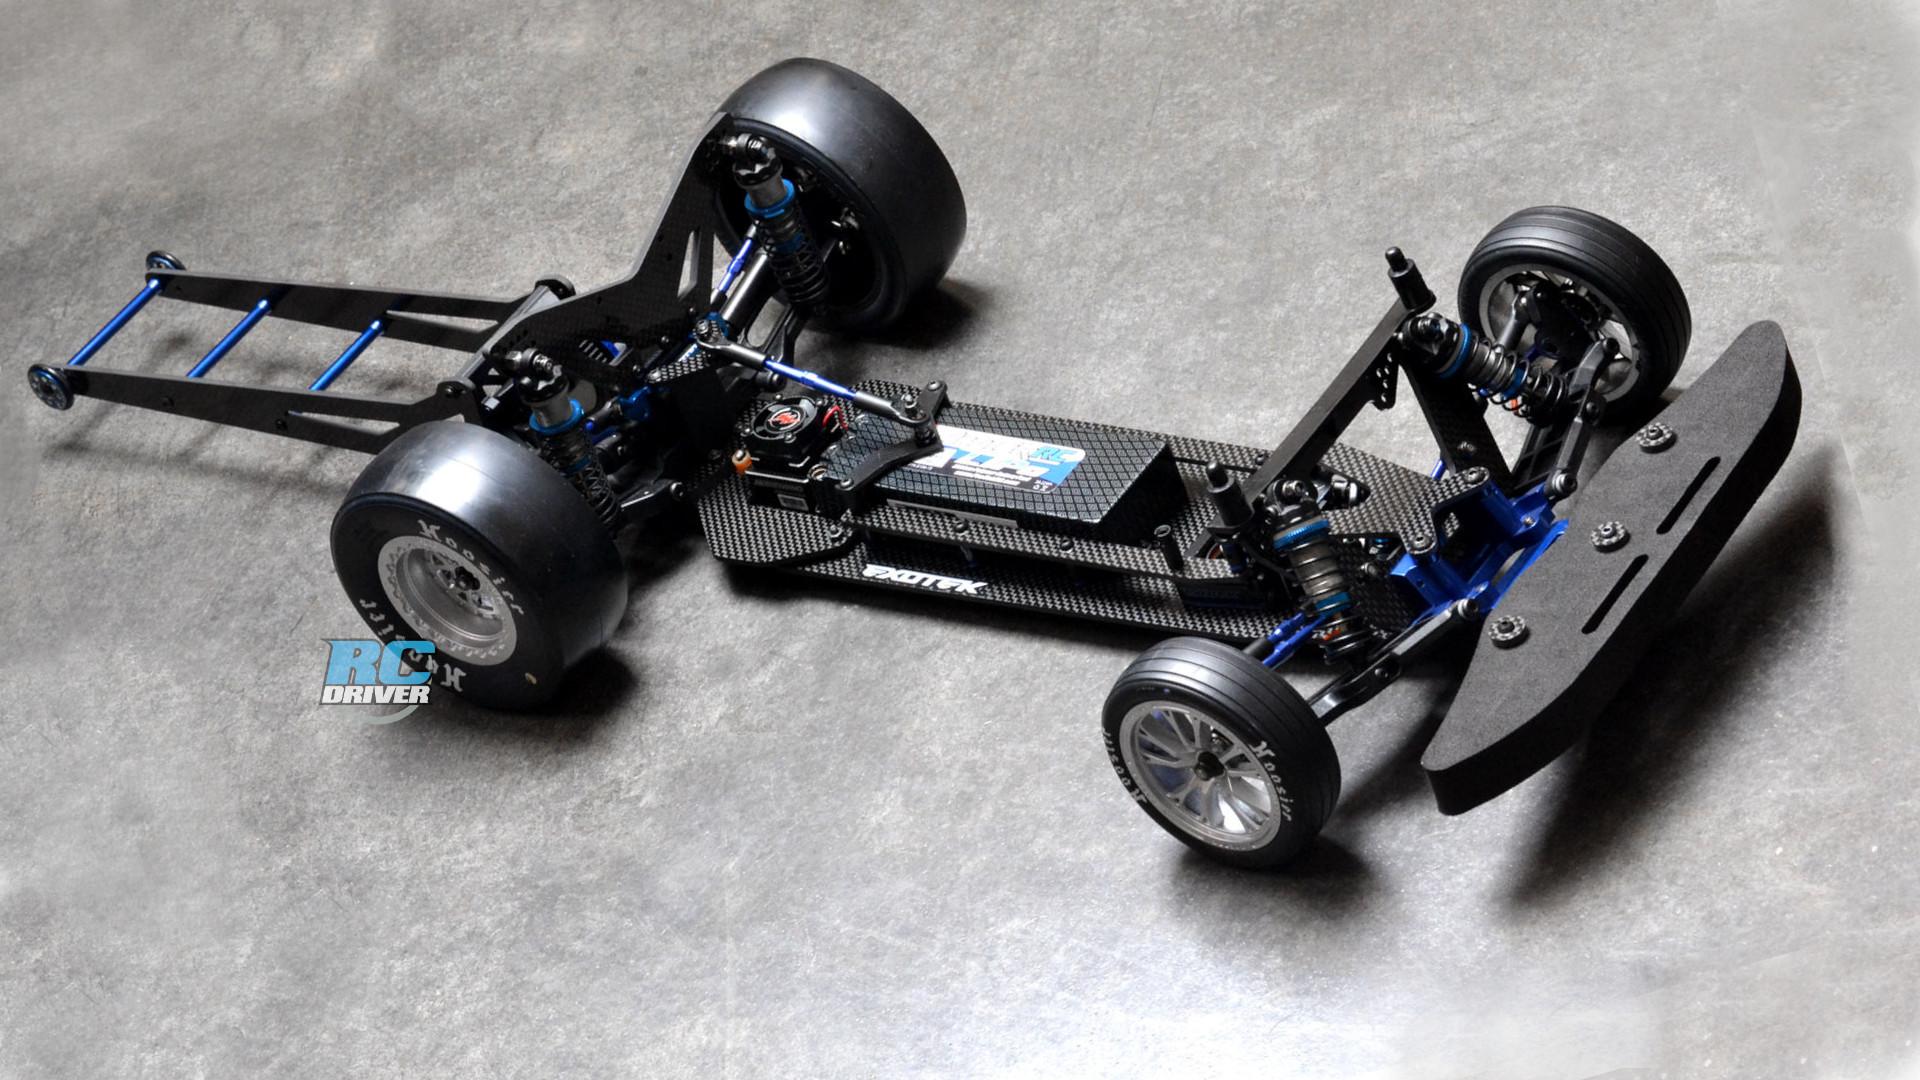 Exotek TX Vader Drag Chassis Conversion